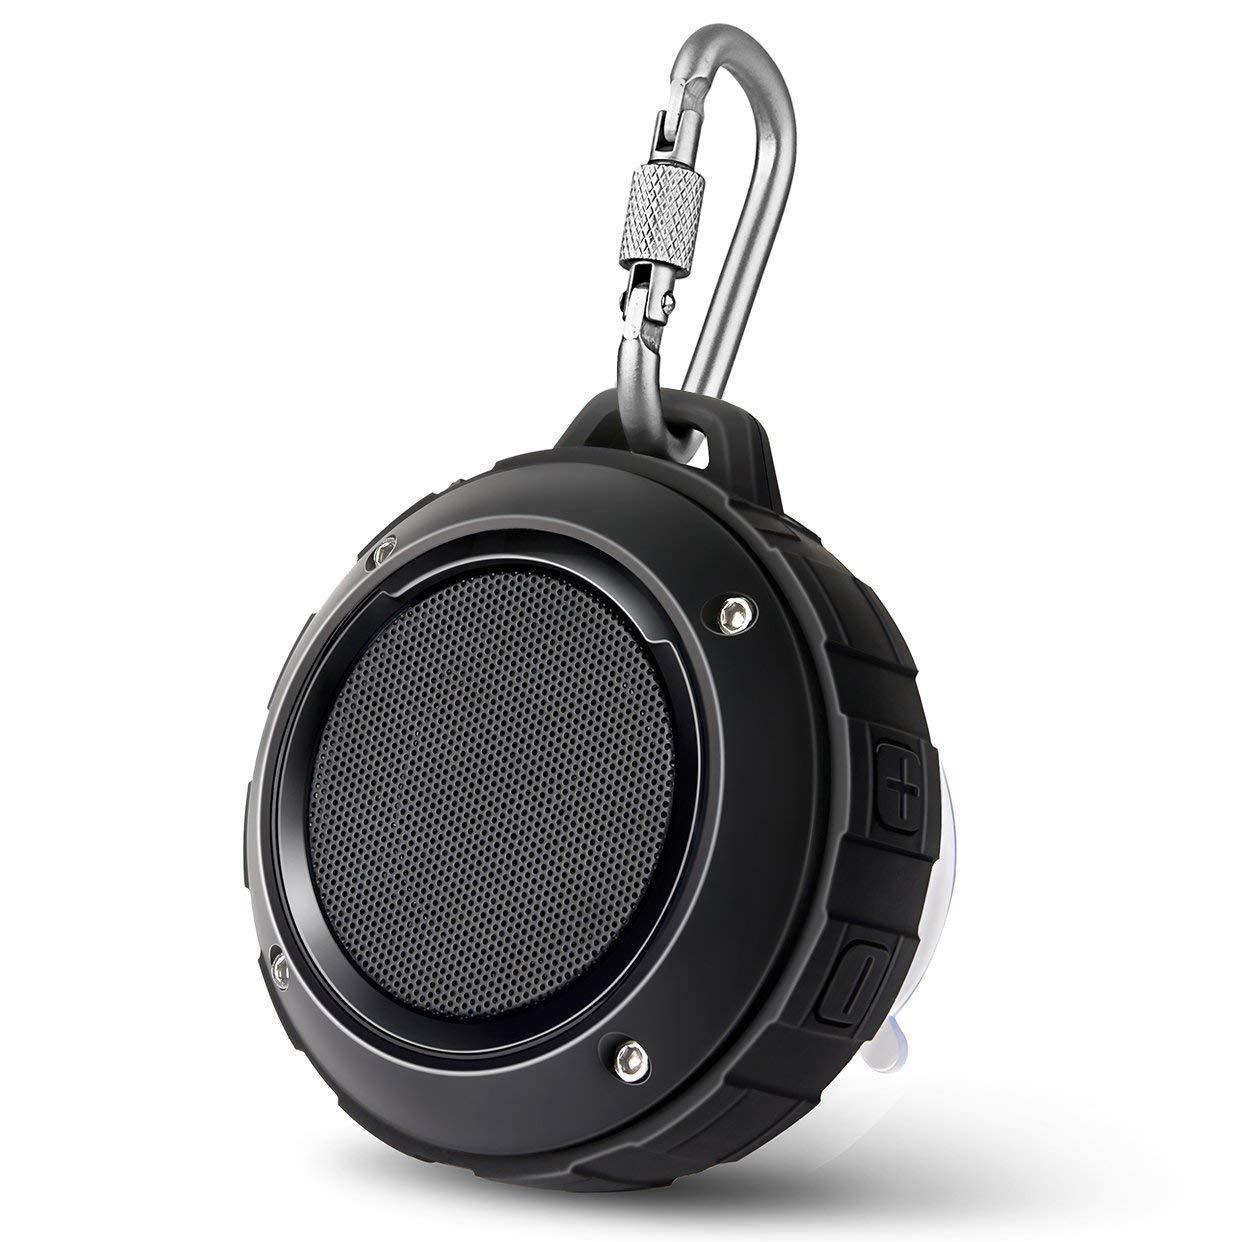 Outdoor Waterproof Bluetooth Speaker,Kunodi Wireless Portable Mini Shower Travel Speaker with Subwoofer, Enhanced Bass, Built in Mic for Sports, Pool, Beach, Hiking, Camping (Black) by Kunodi